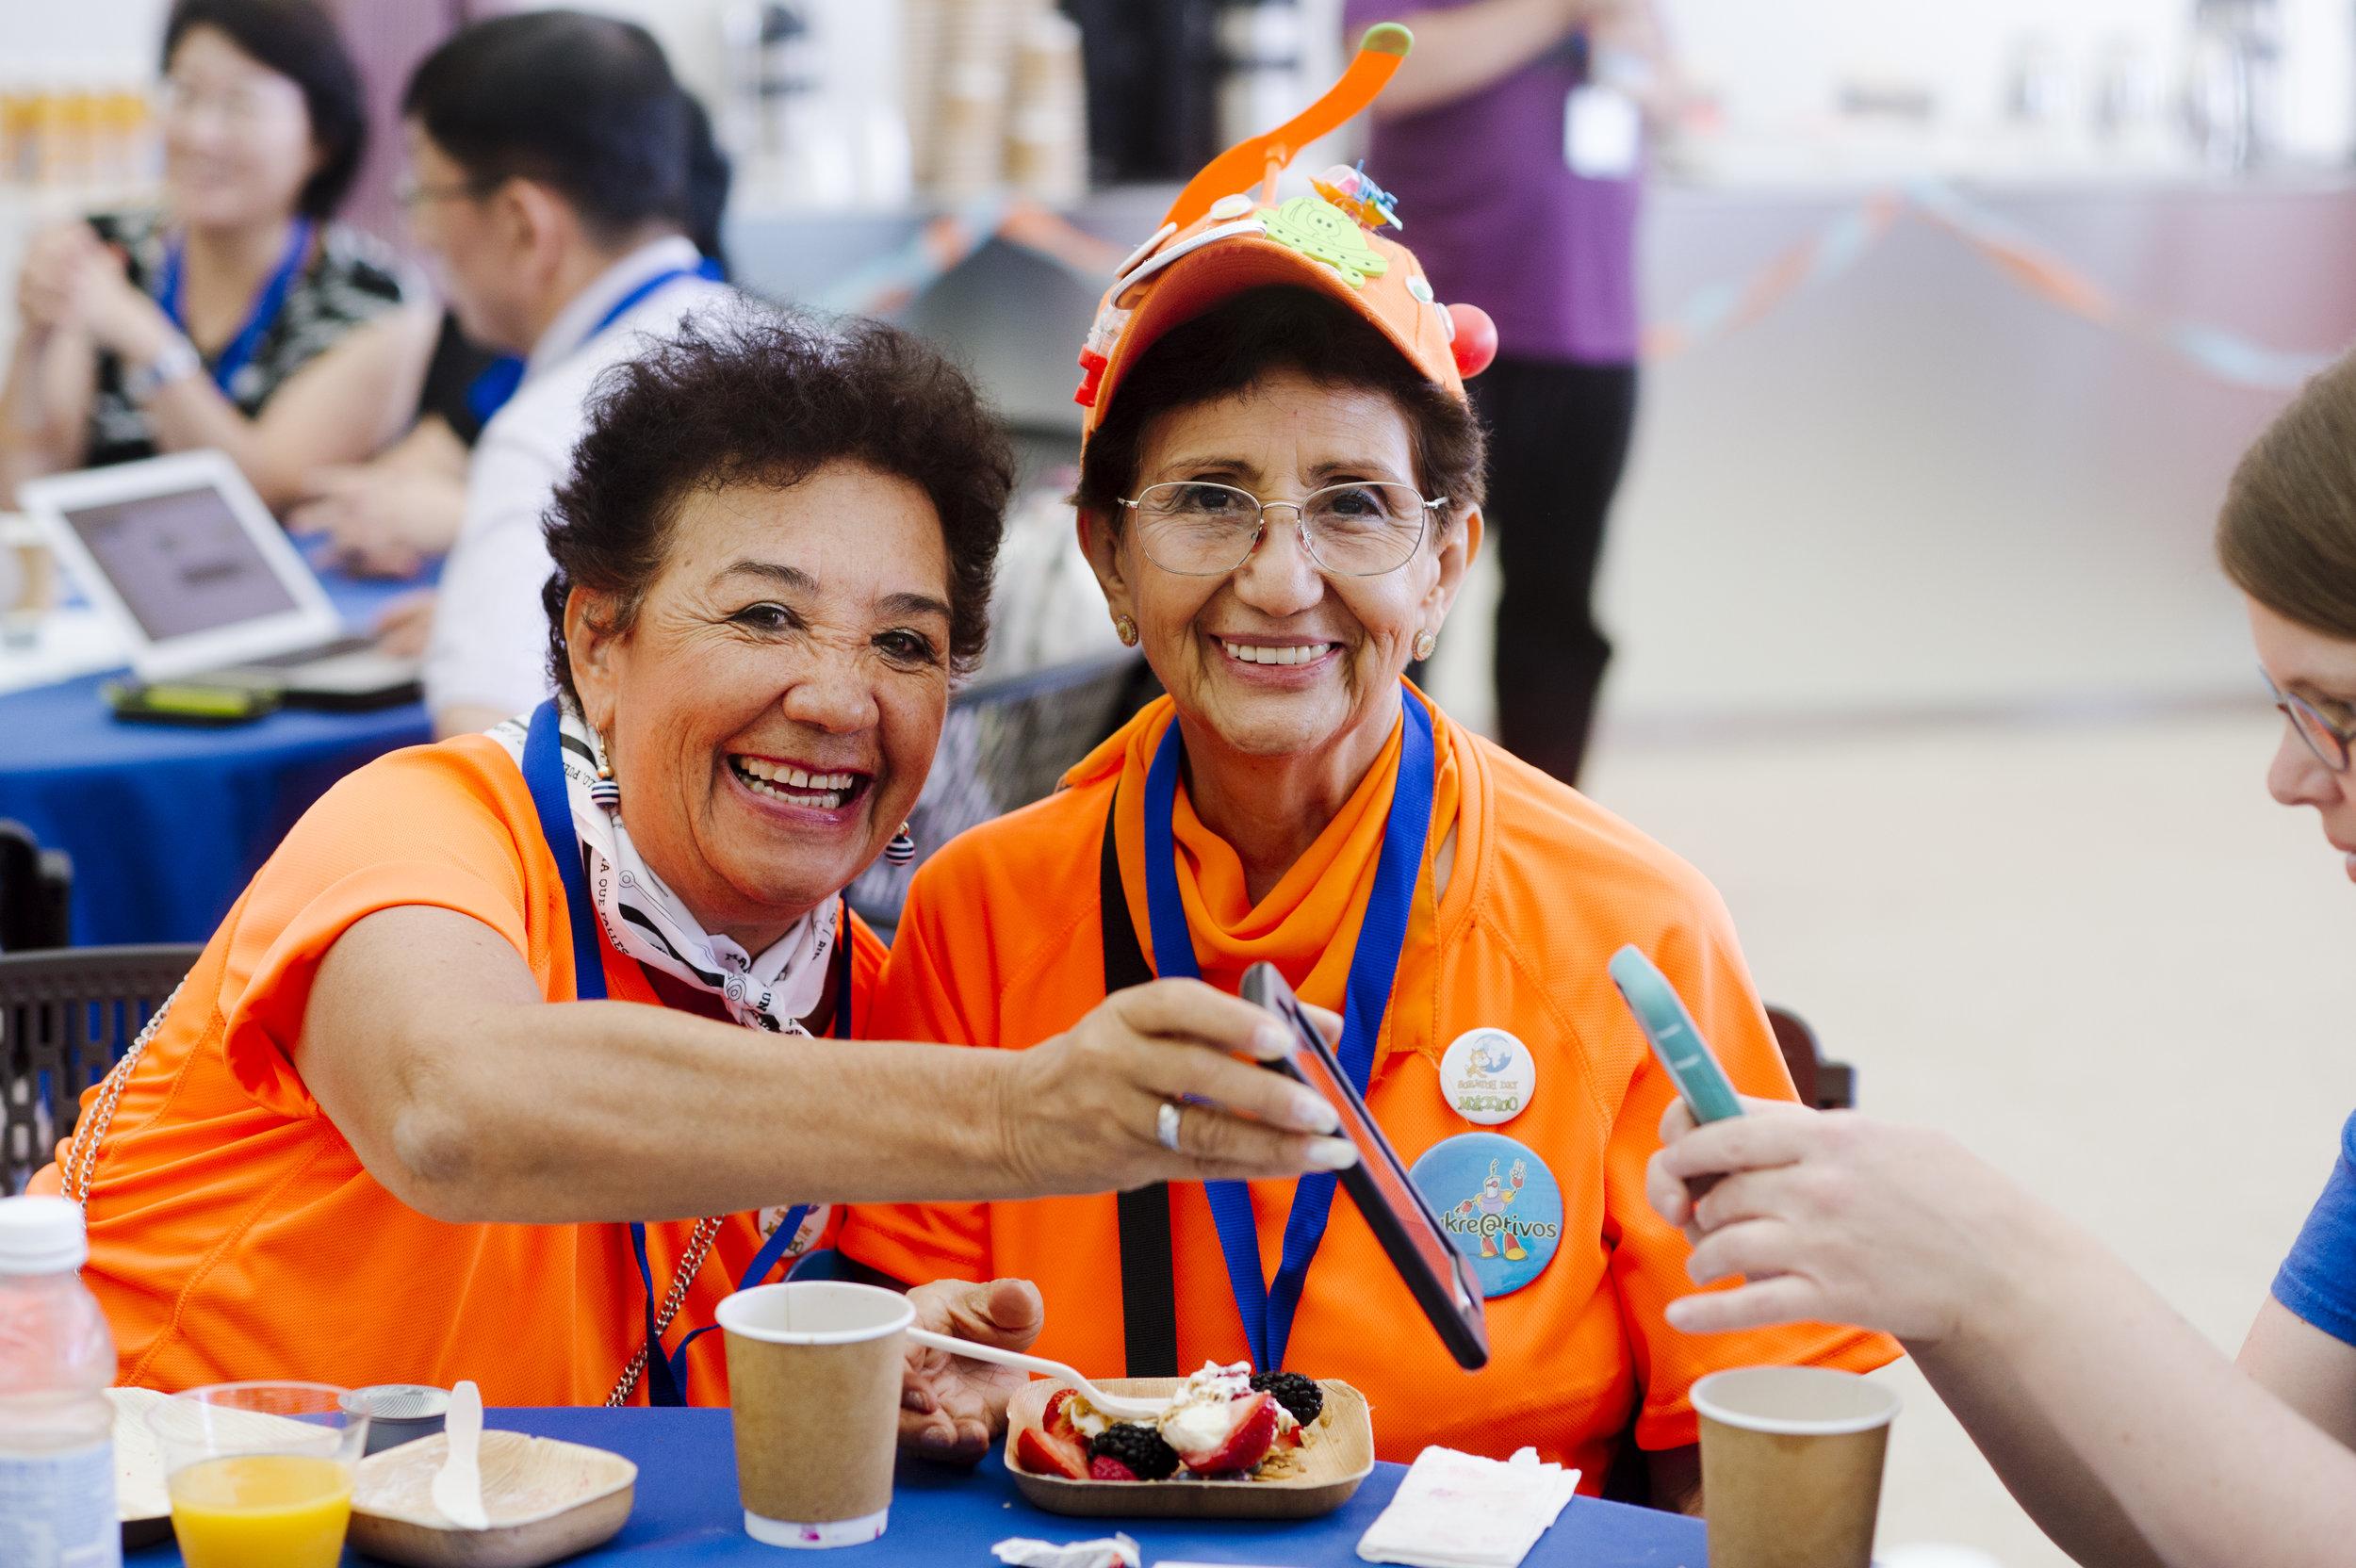 Women dressed in orange at Scratch Conf